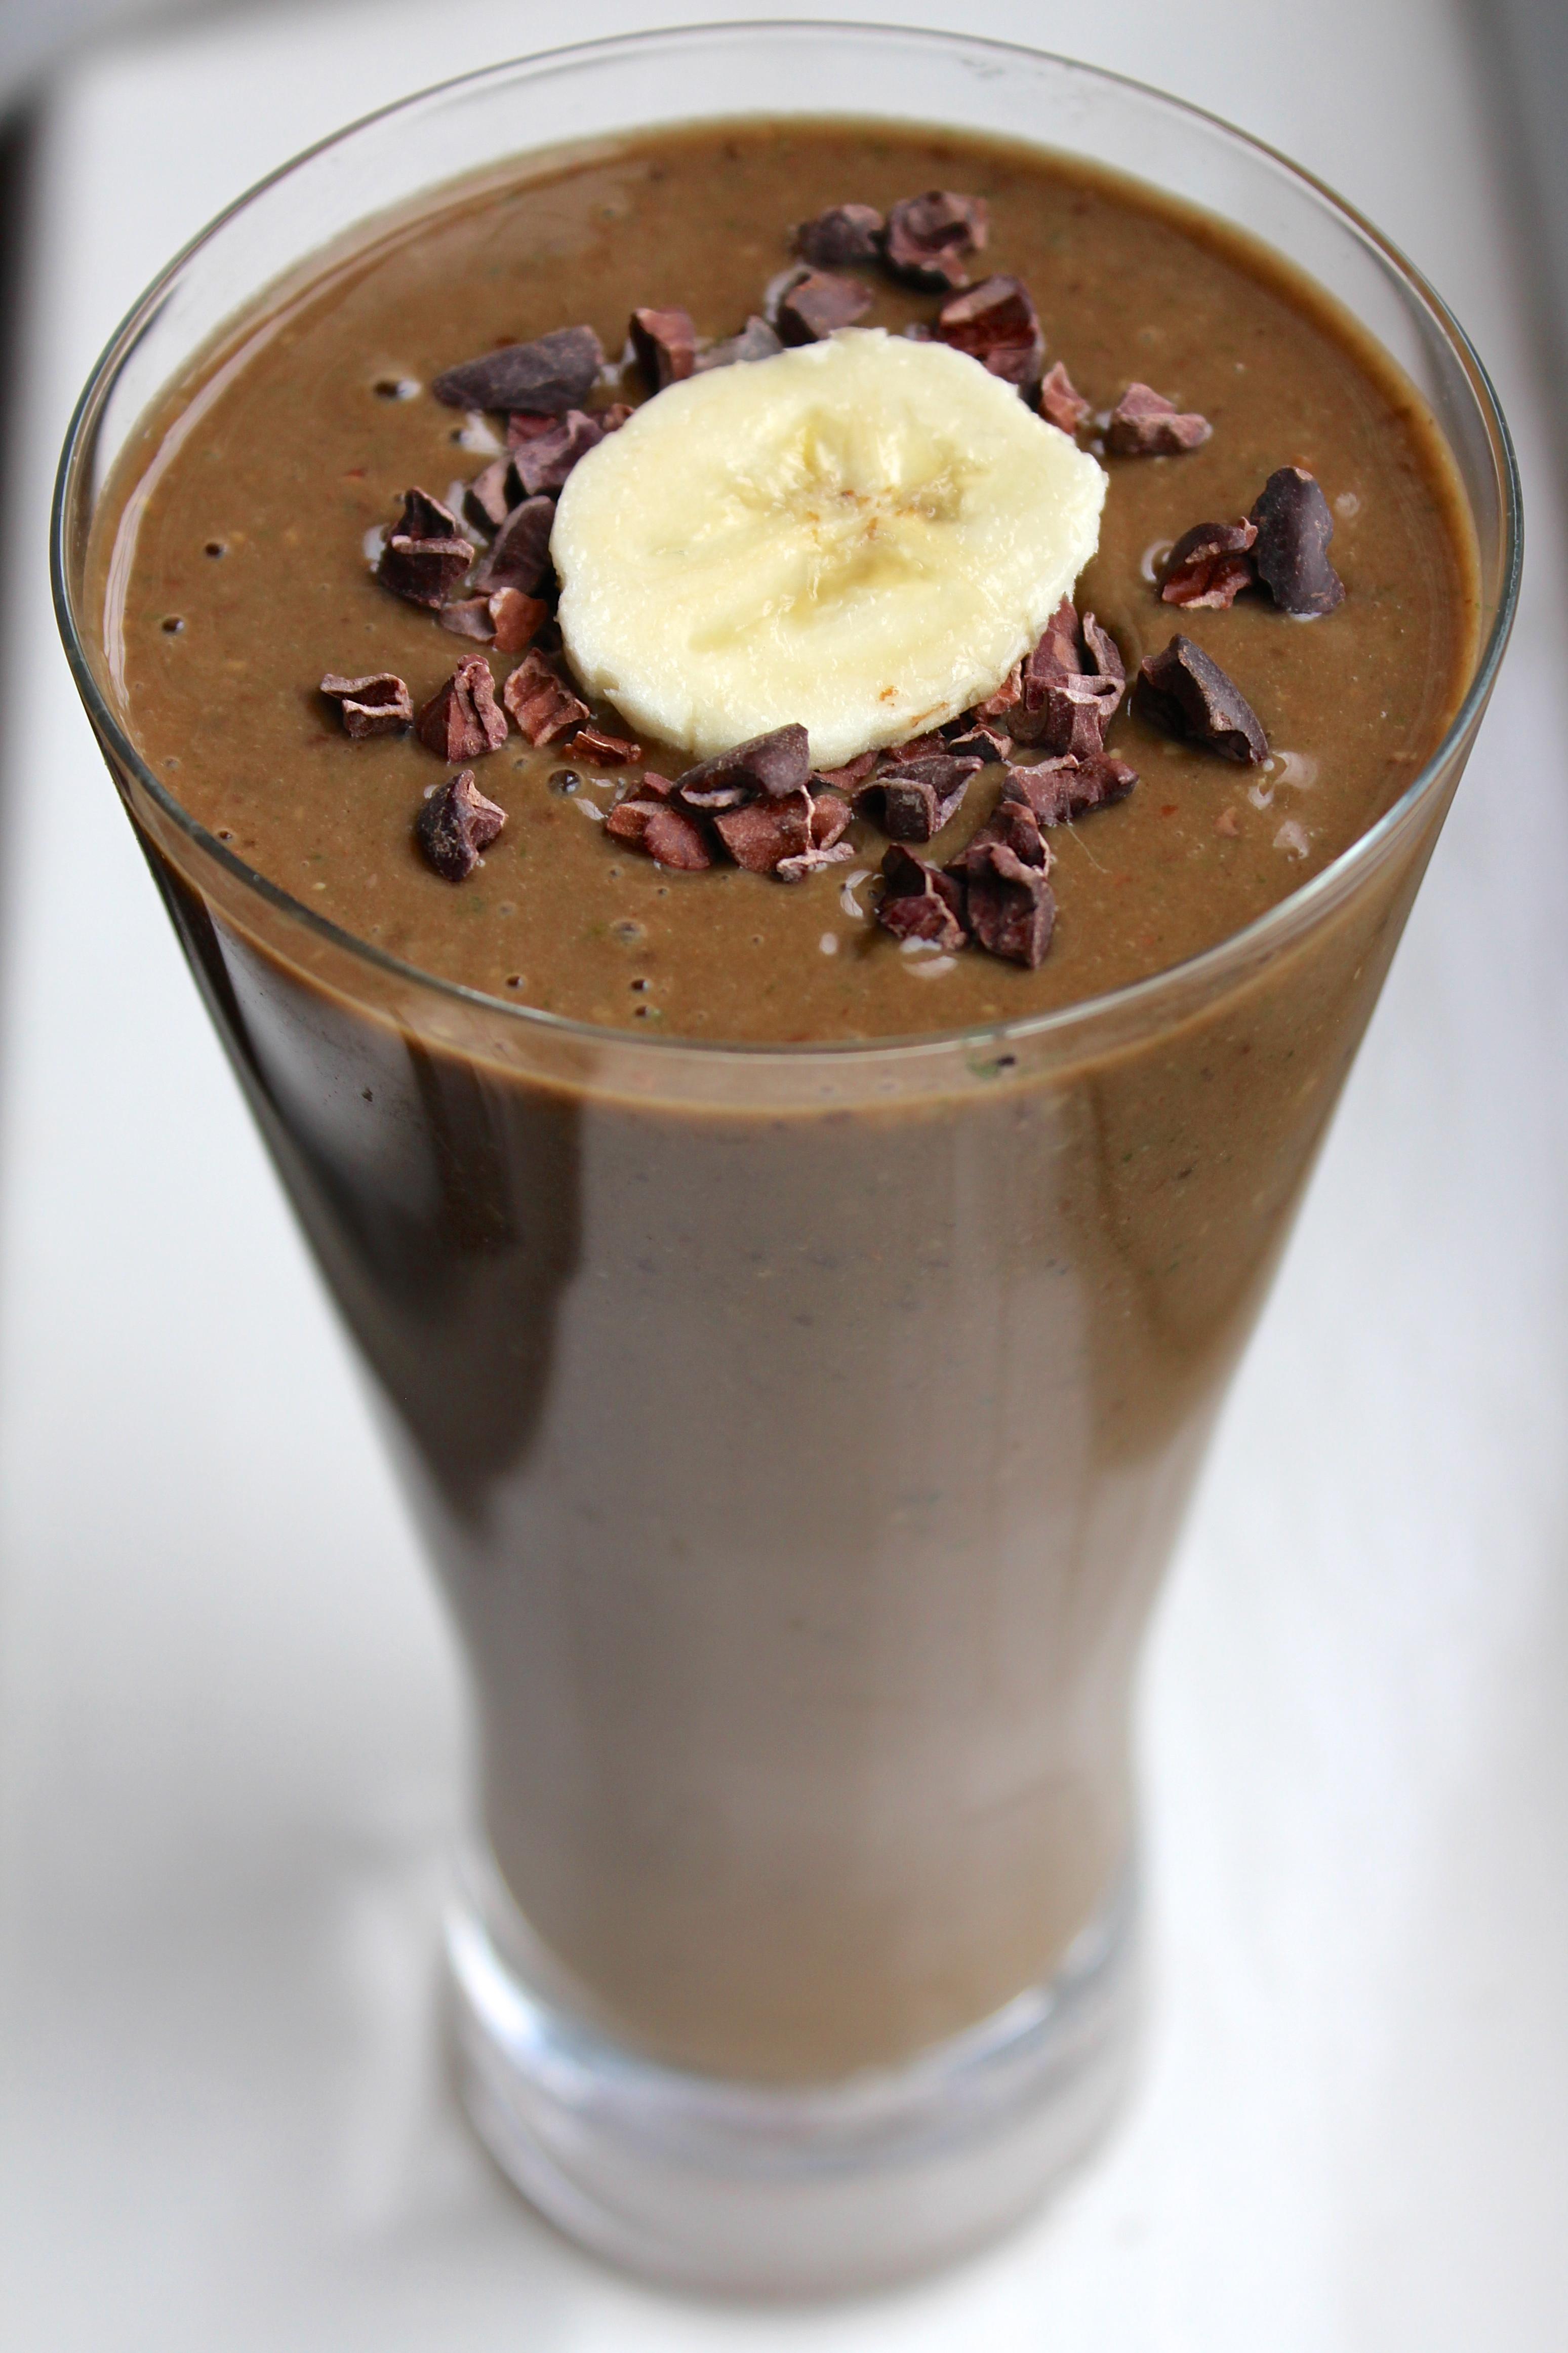 Banana Cacoa Smoothie